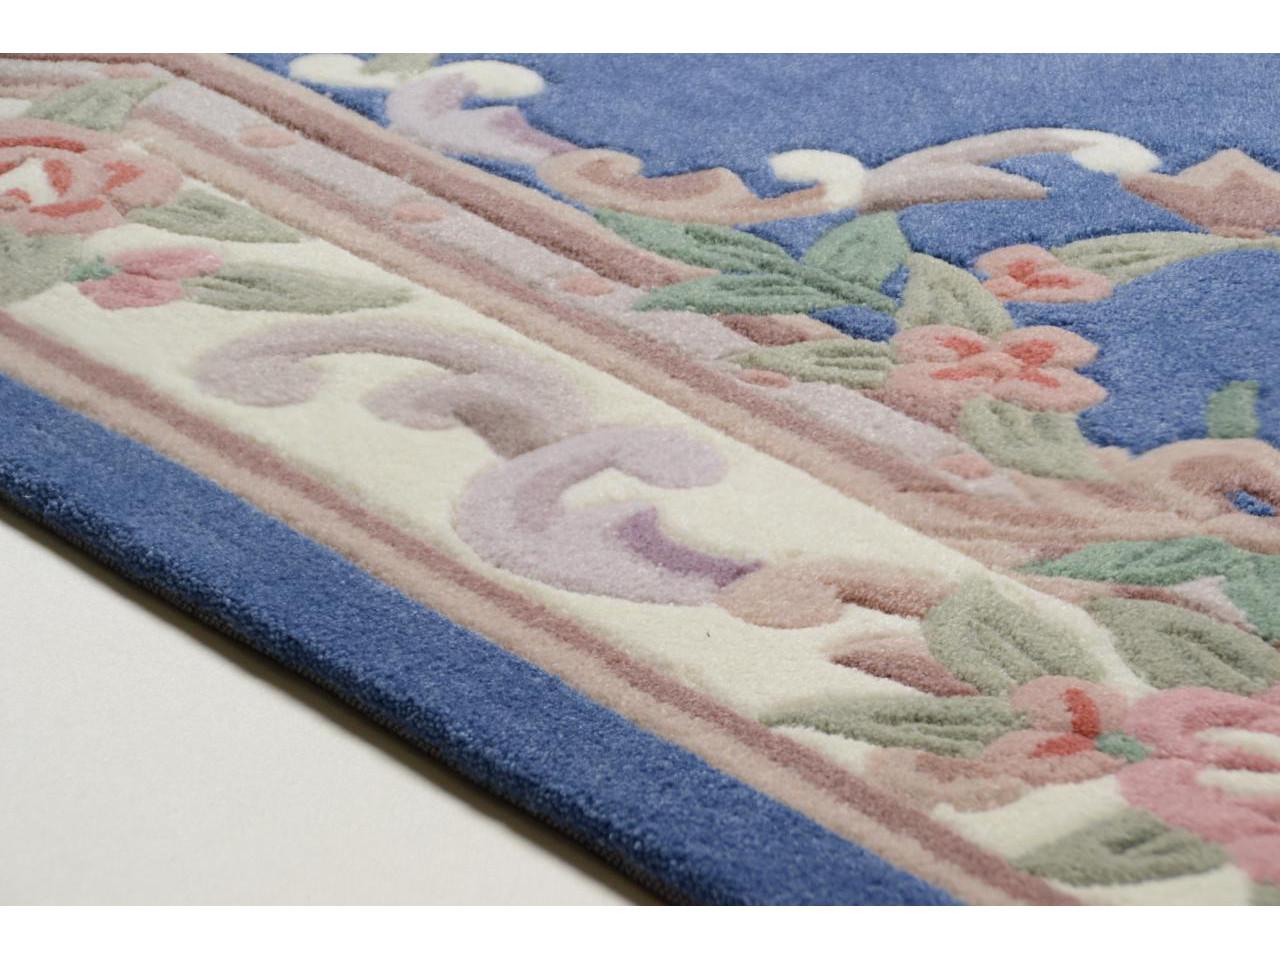 aubusson bleu tapis chinois n 32286 180x120cm. Black Bedroom Furniture Sets. Home Design Ideas